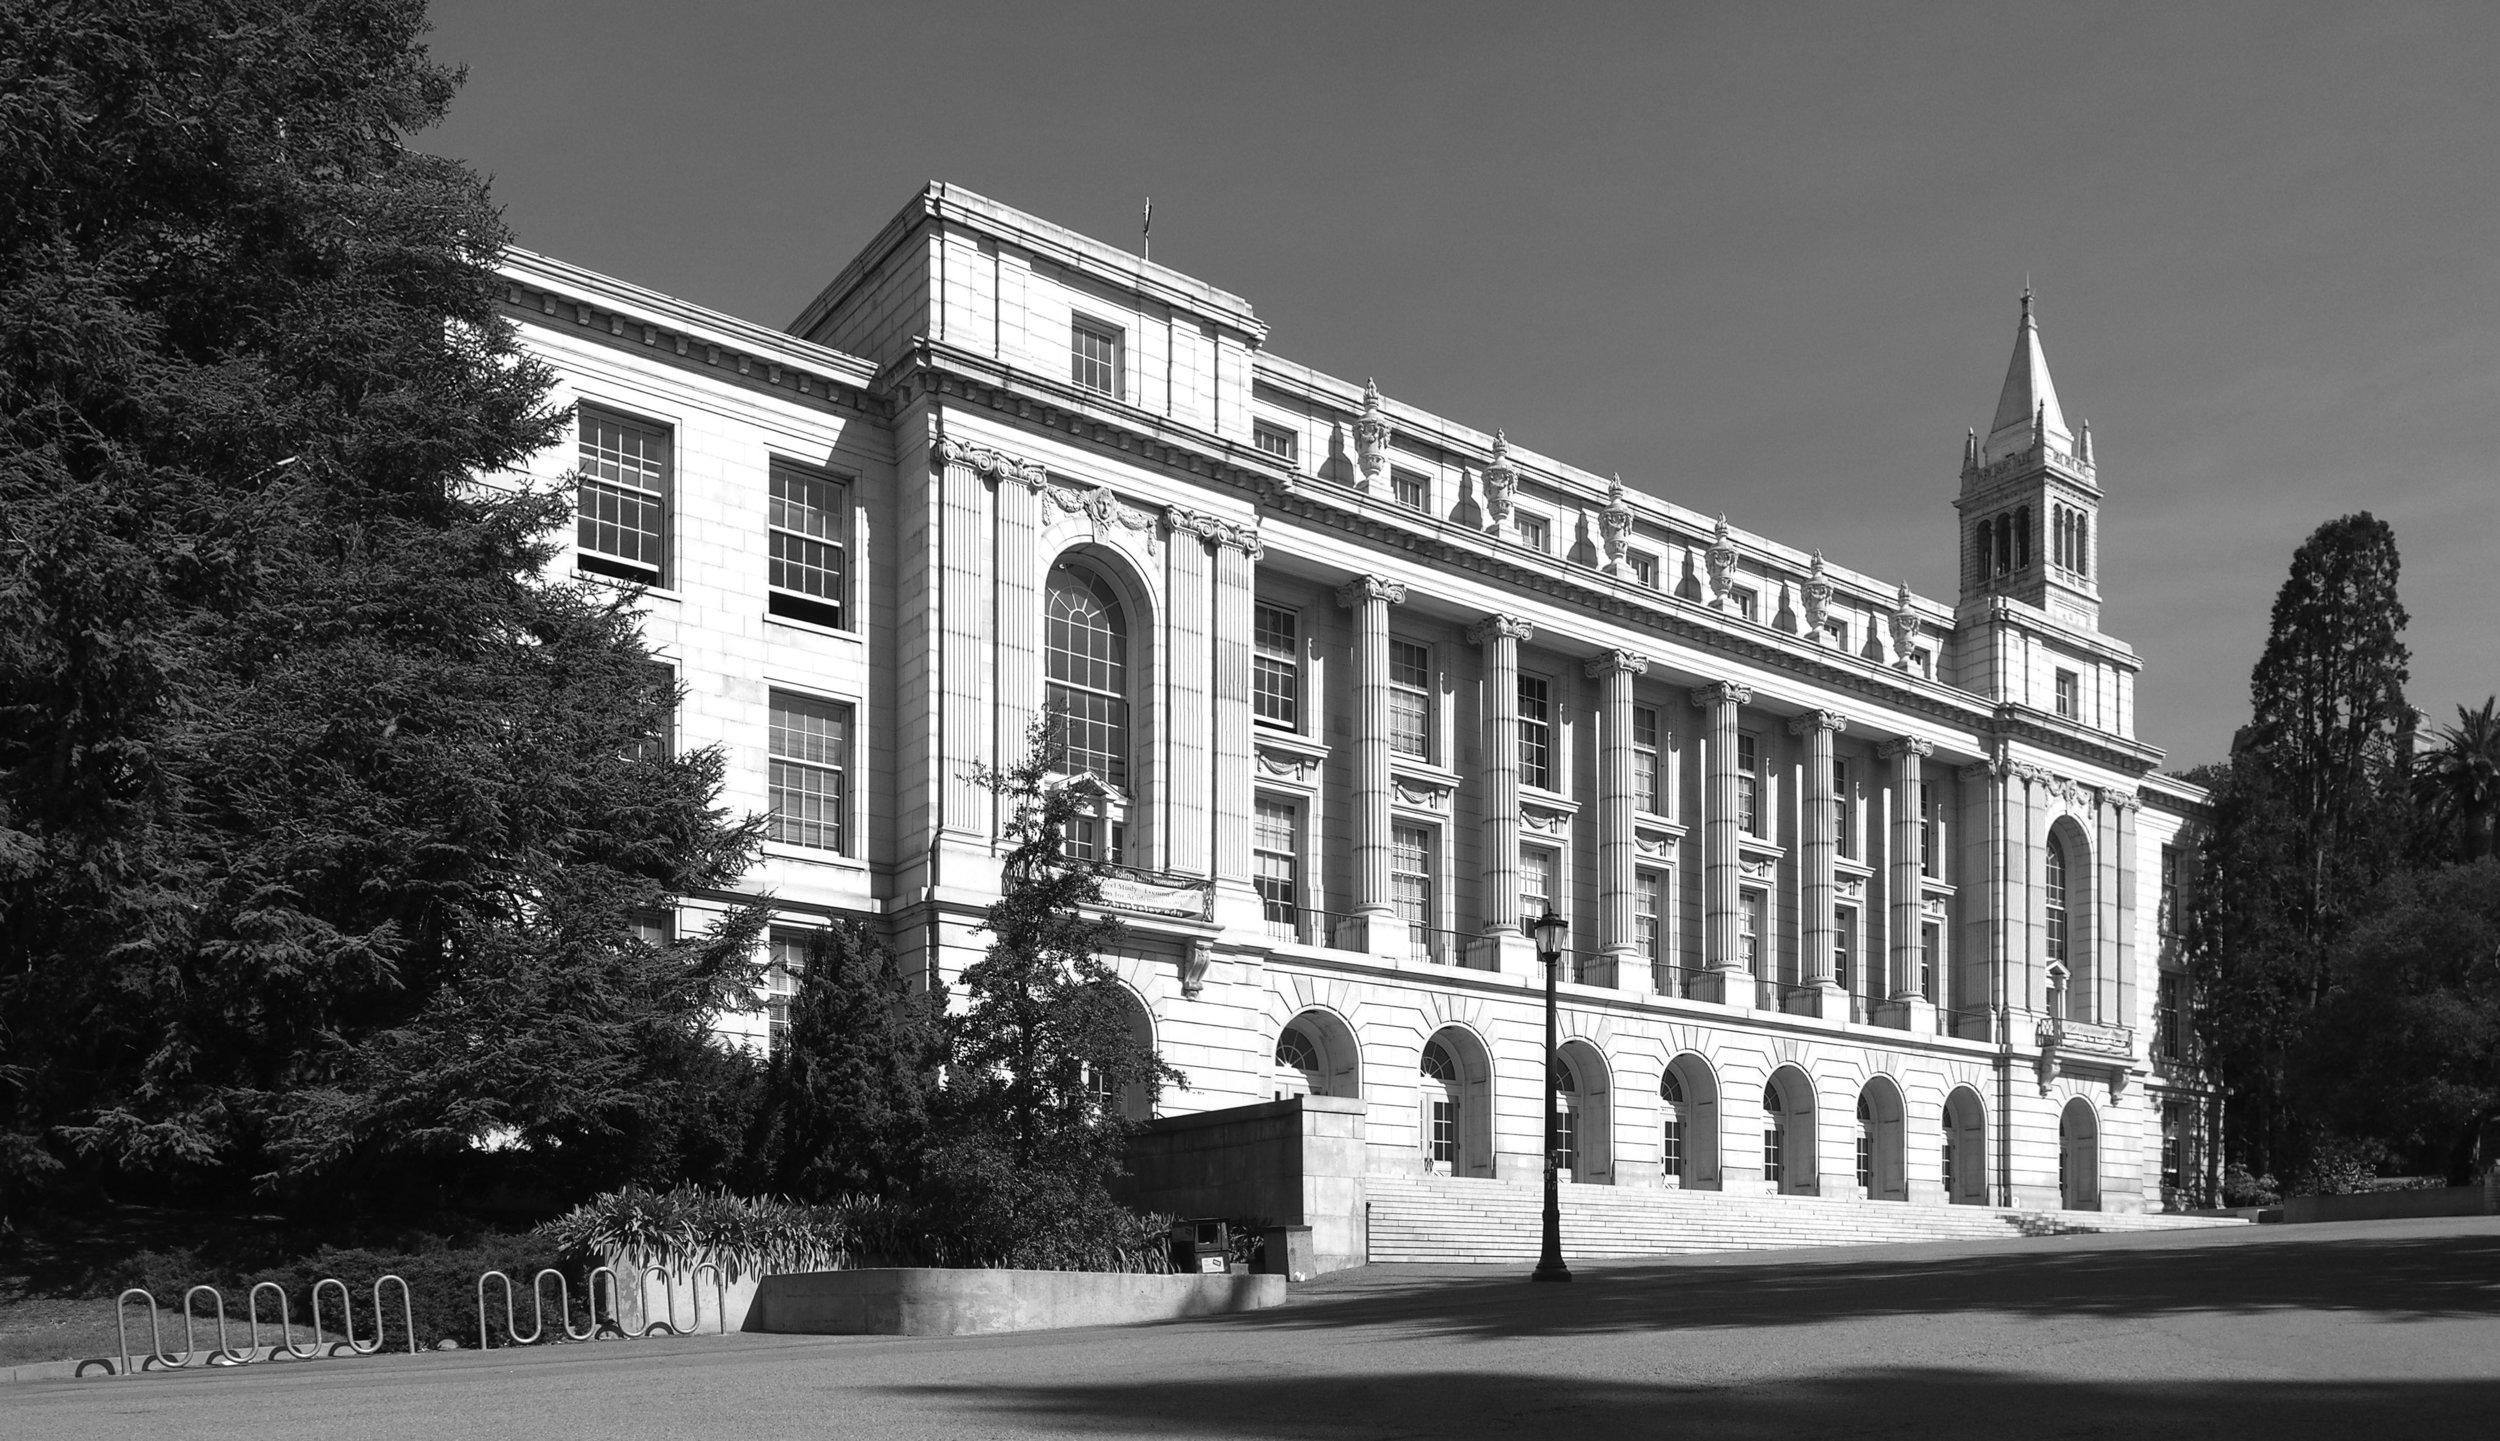 Wheeler Hall, University of California, Berkeley. Wikimedia,  User: Falcorian  Cretaive Commons 3.0